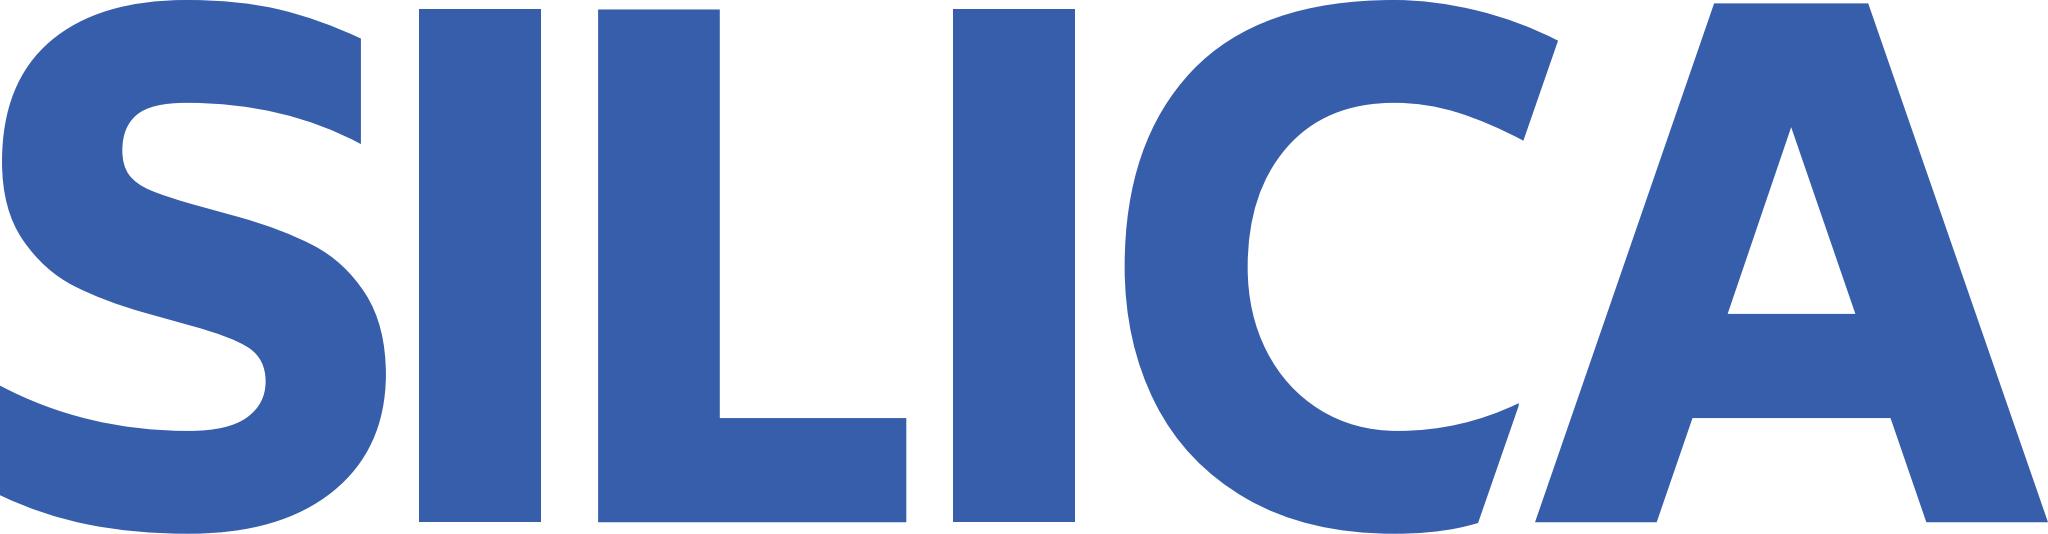 Silica Fiber